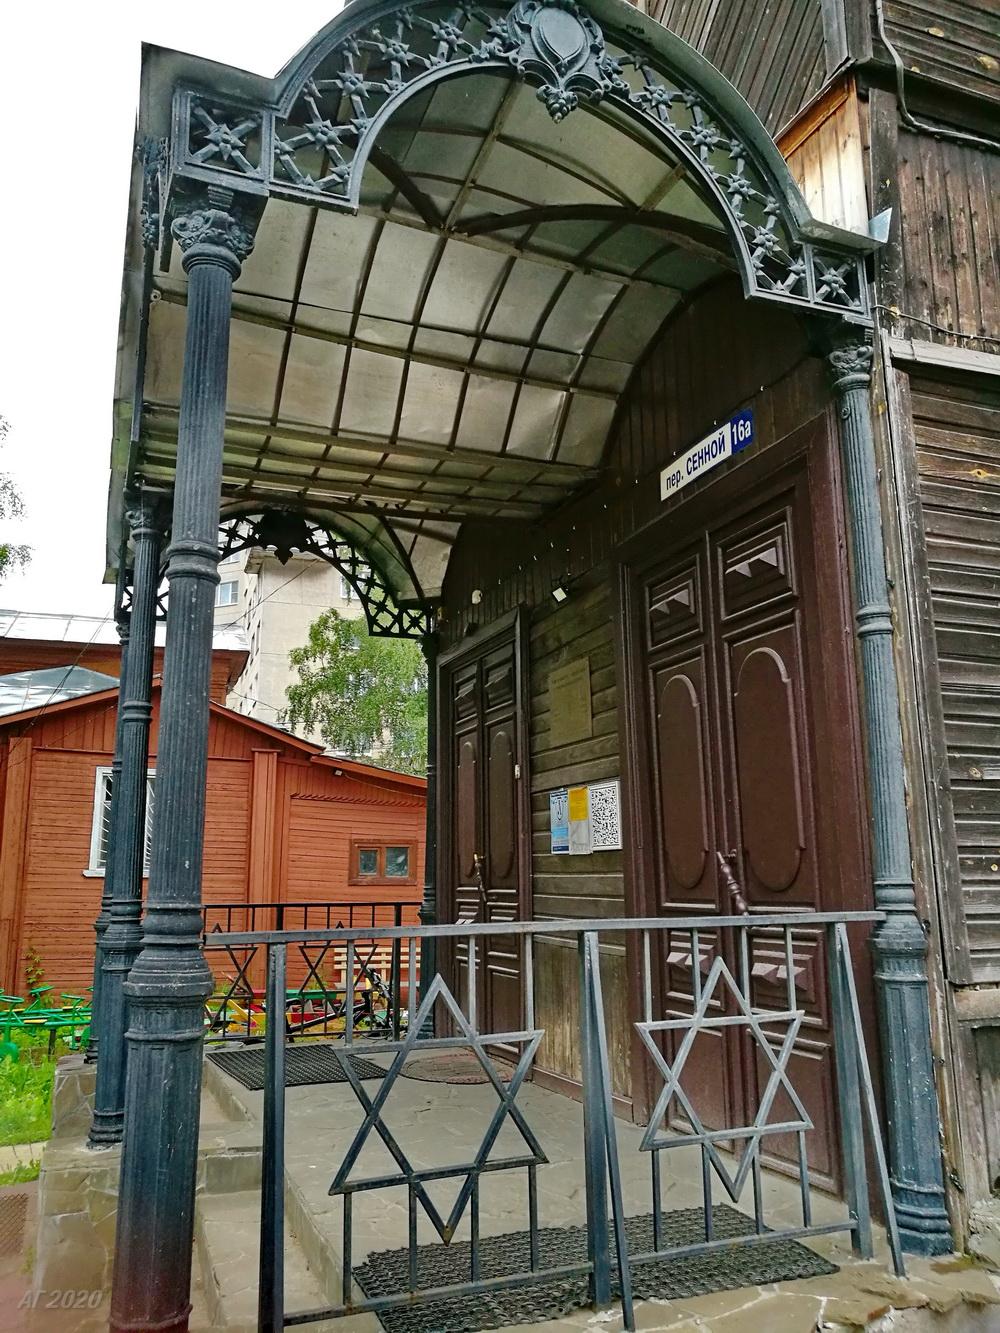 Крыльцо. Костромская синагога, Кострома, 02.08.2020